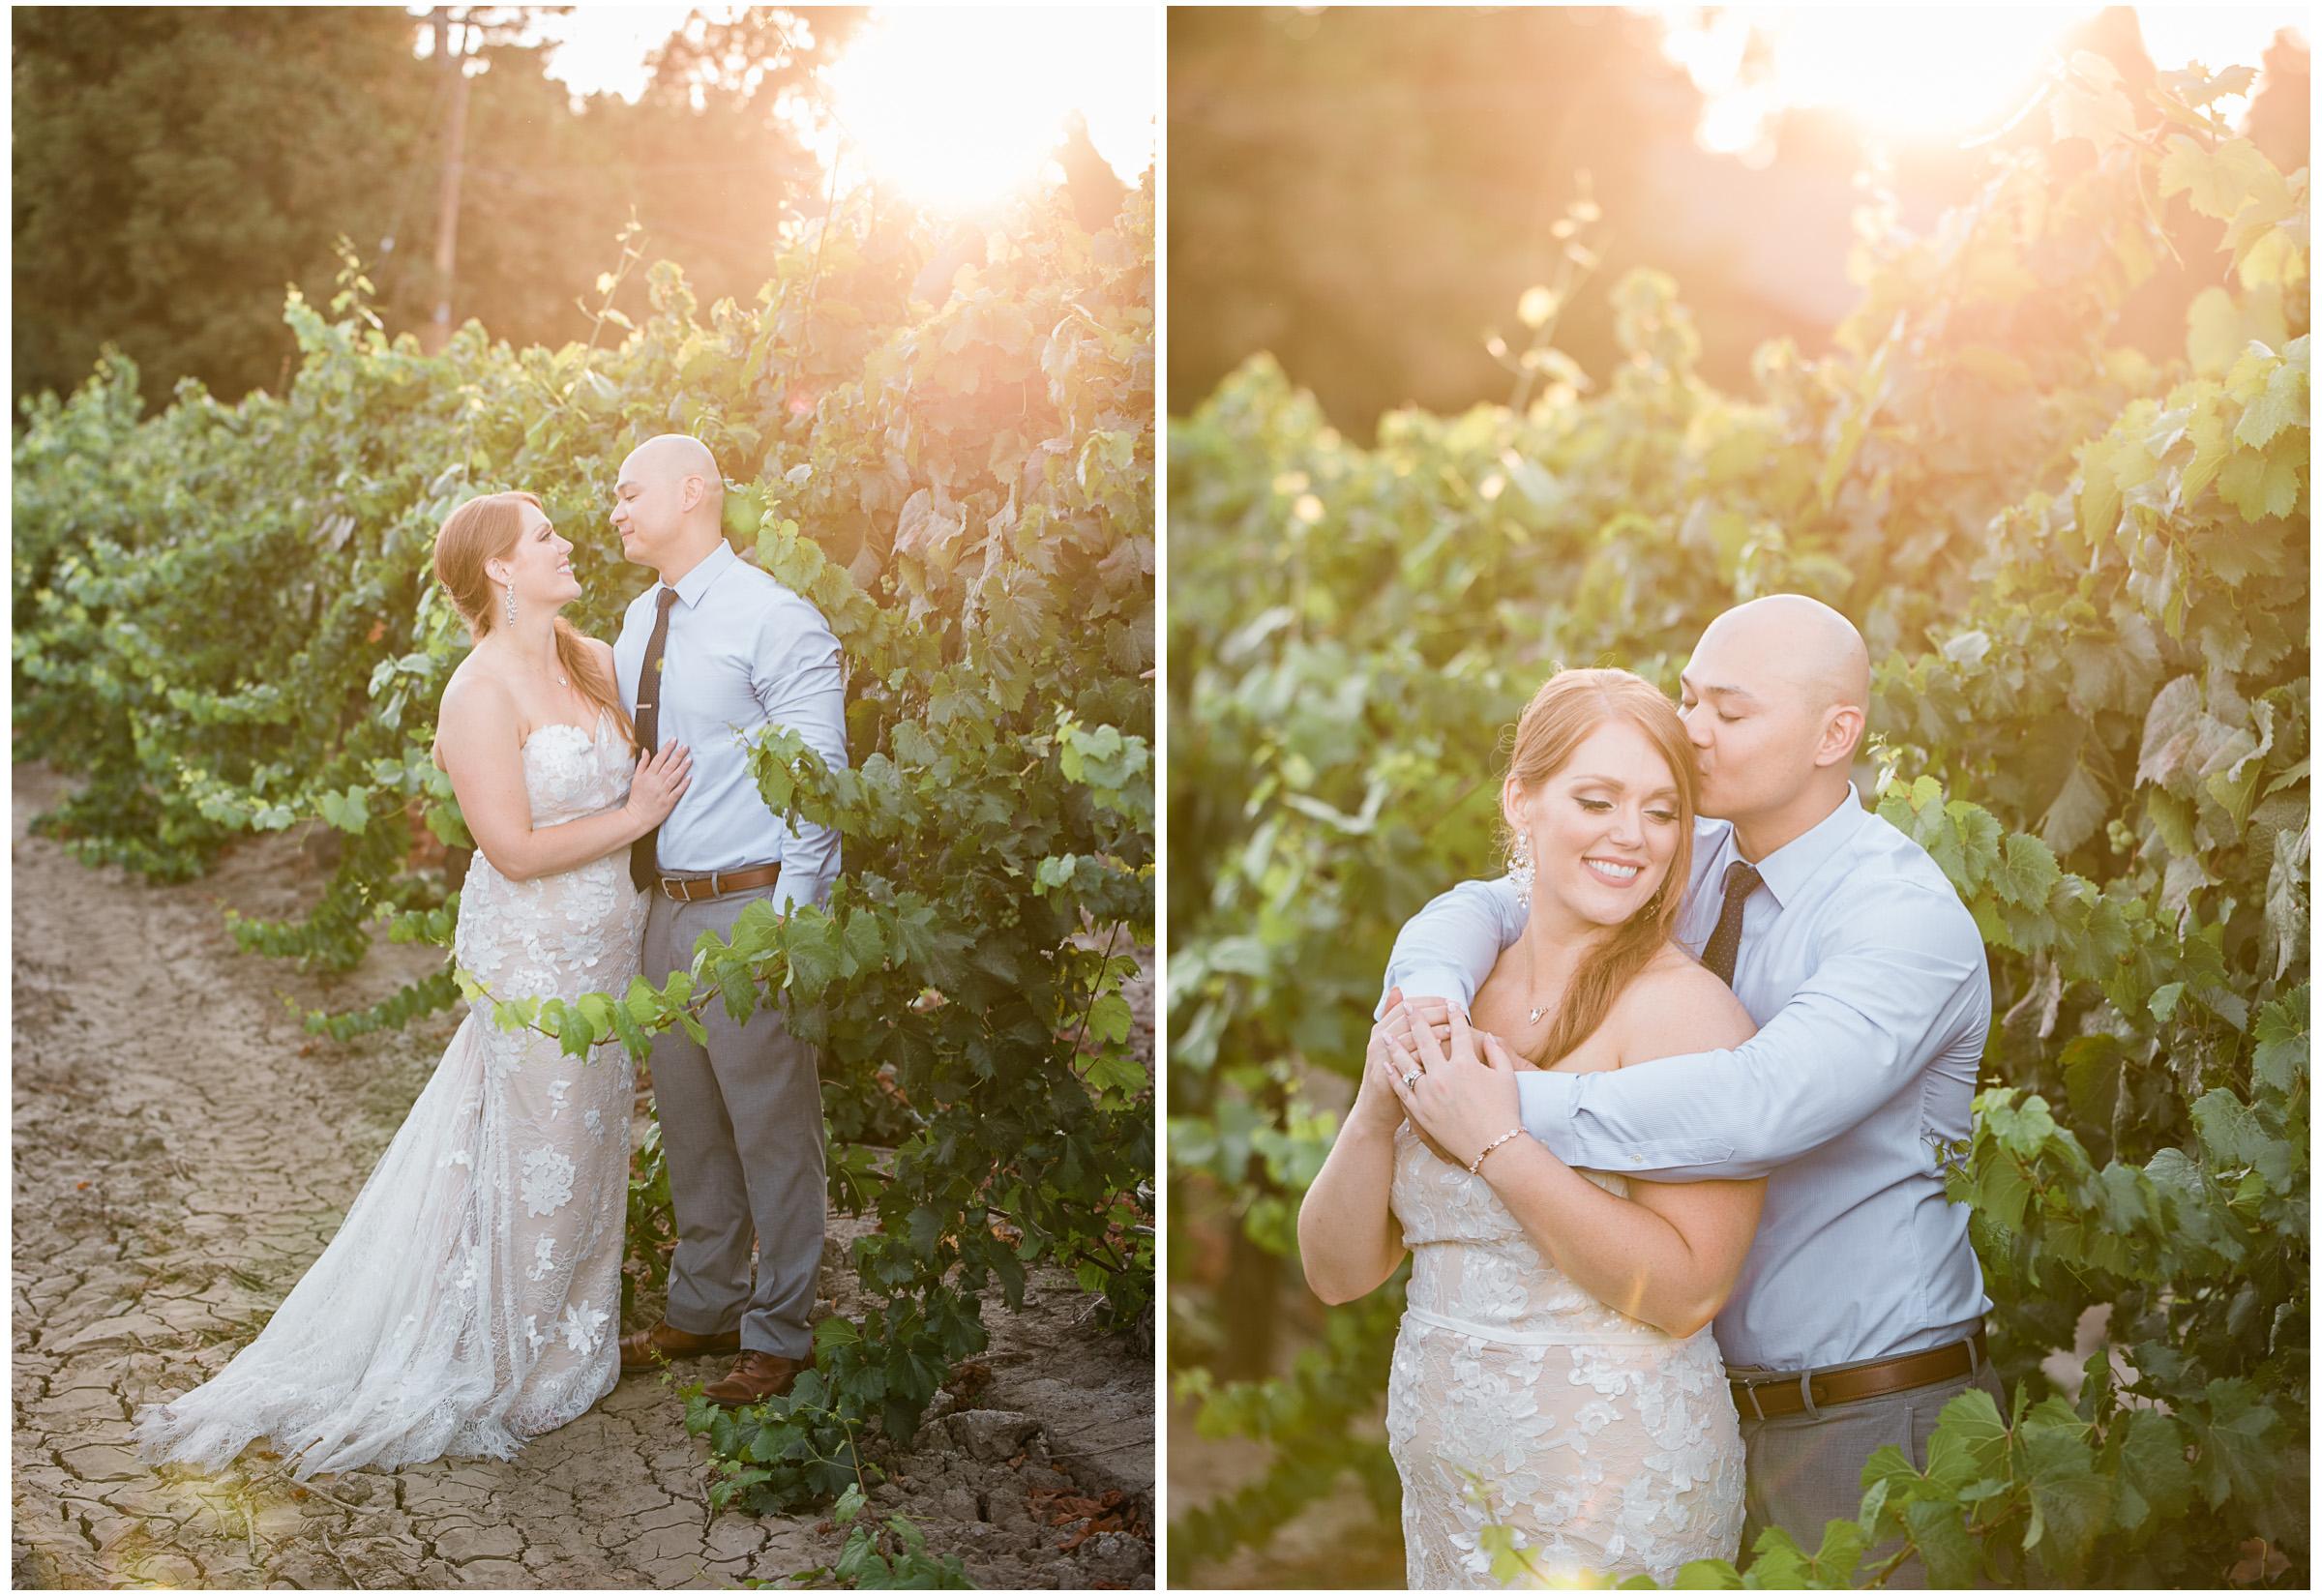 Clarksburg Wedding - Sacramento Photographer - Bogle Winery - Justin Wilcox Photography - 23.jpg